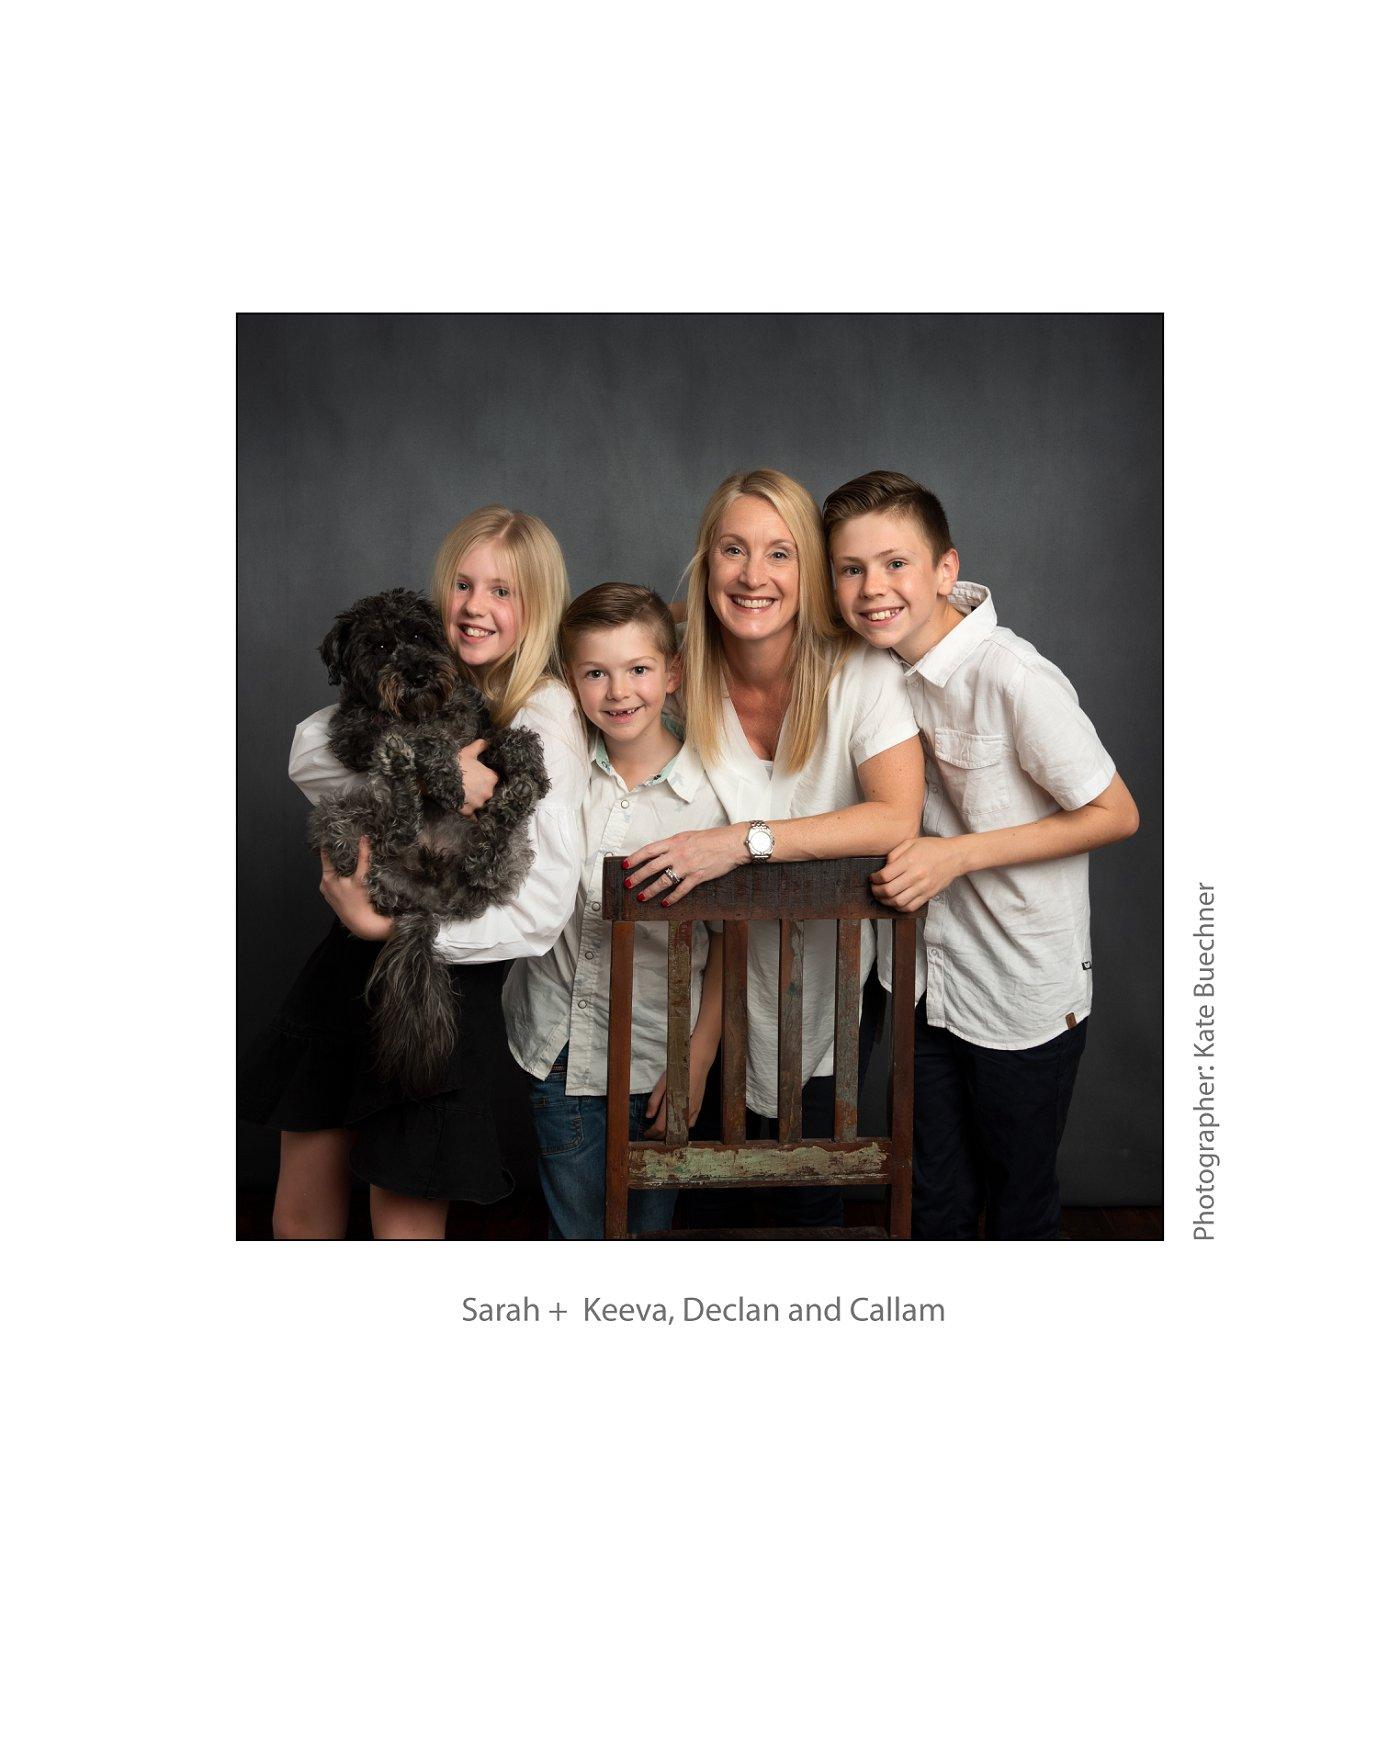 family photographer sydney (1).jpg